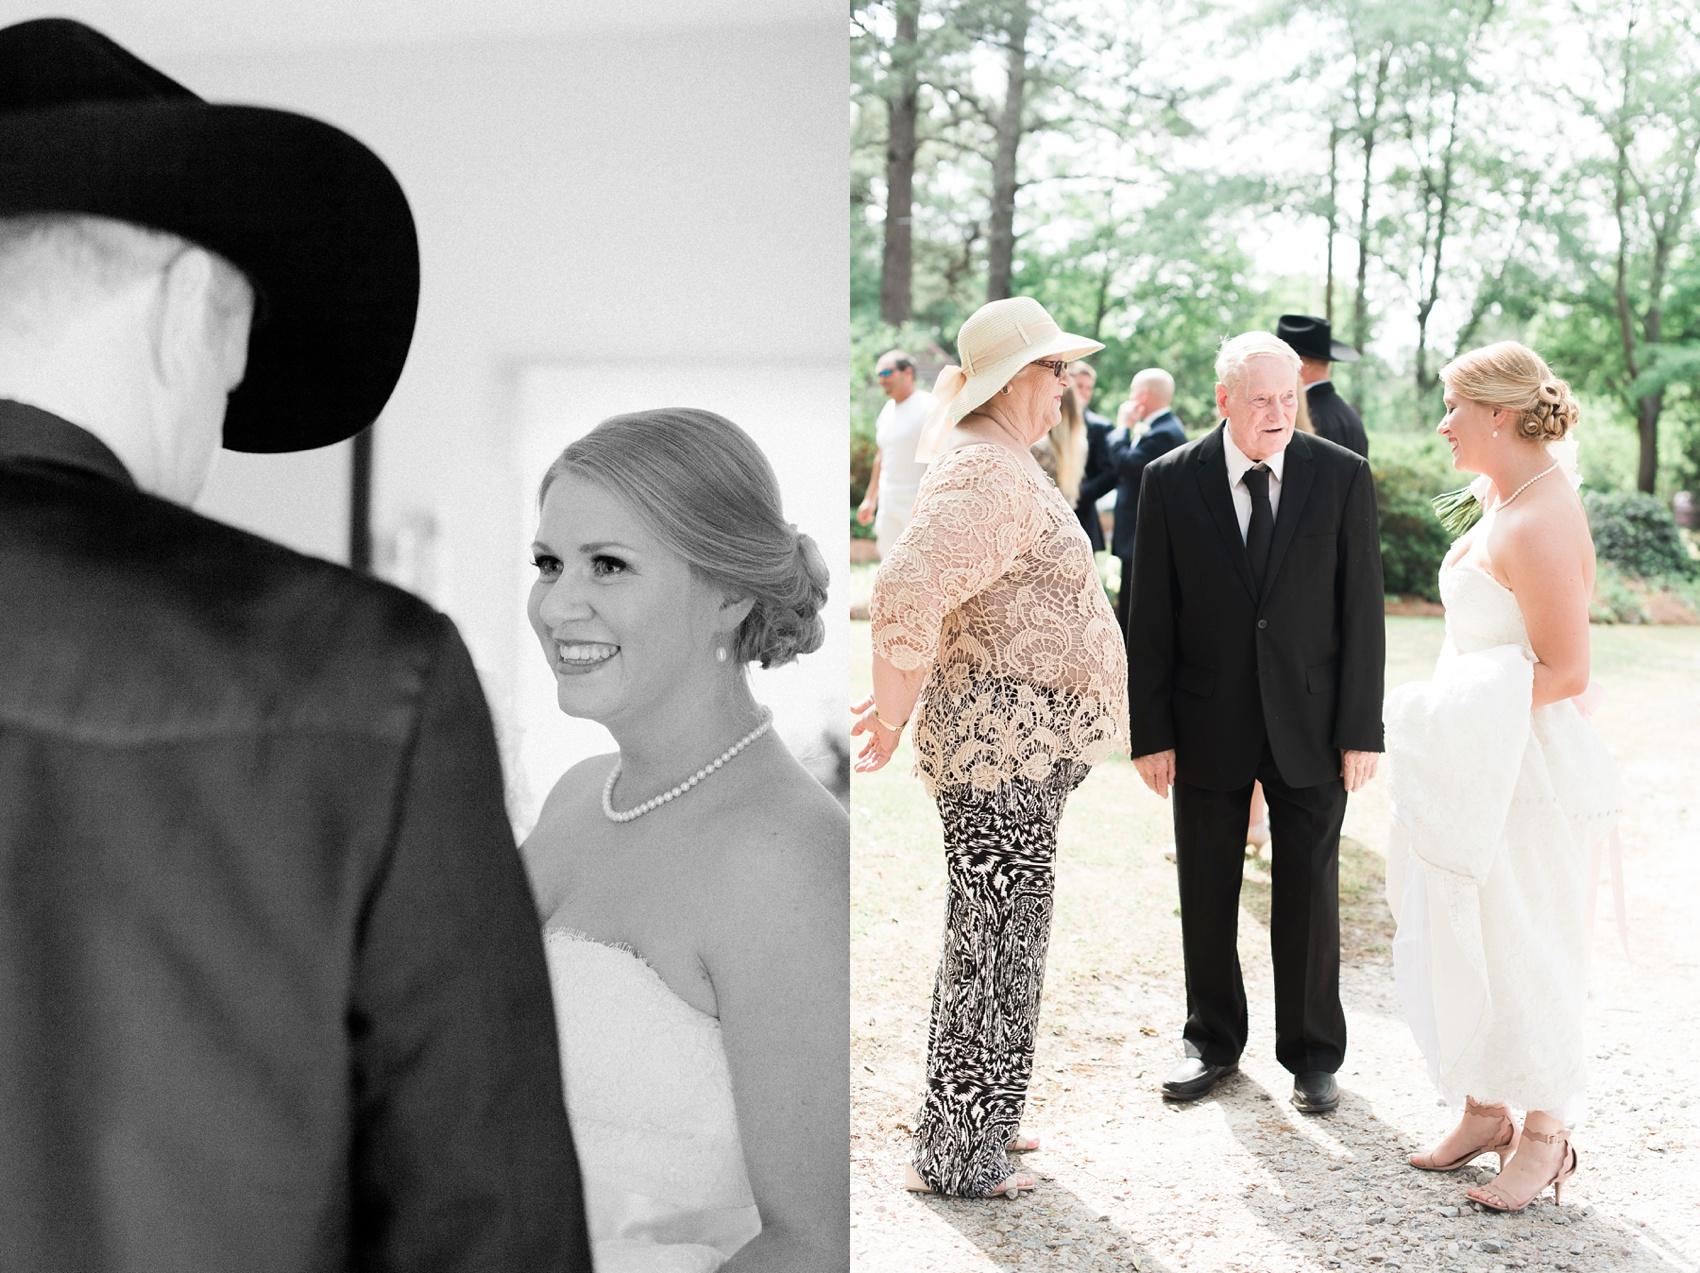 lexington_wedding_photographer_0123.jpg